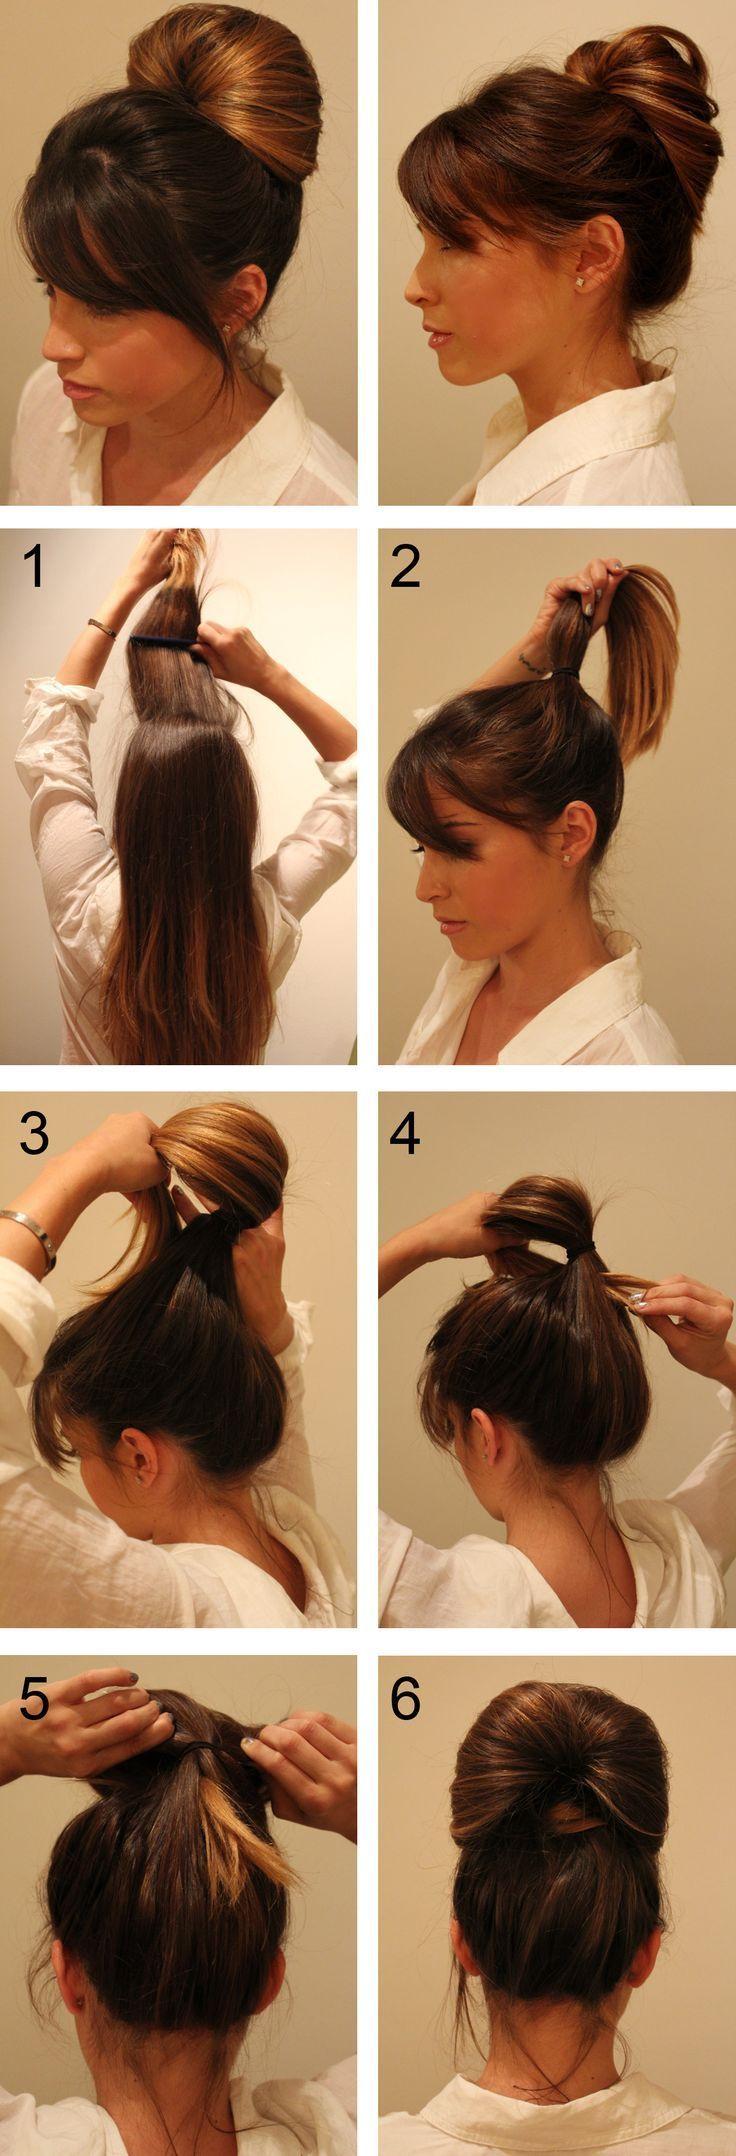 Enjoyable 1000 Ideas About Bun Hairstyles On Pinterest Haircuts Short Hairstyles Gunalazisus